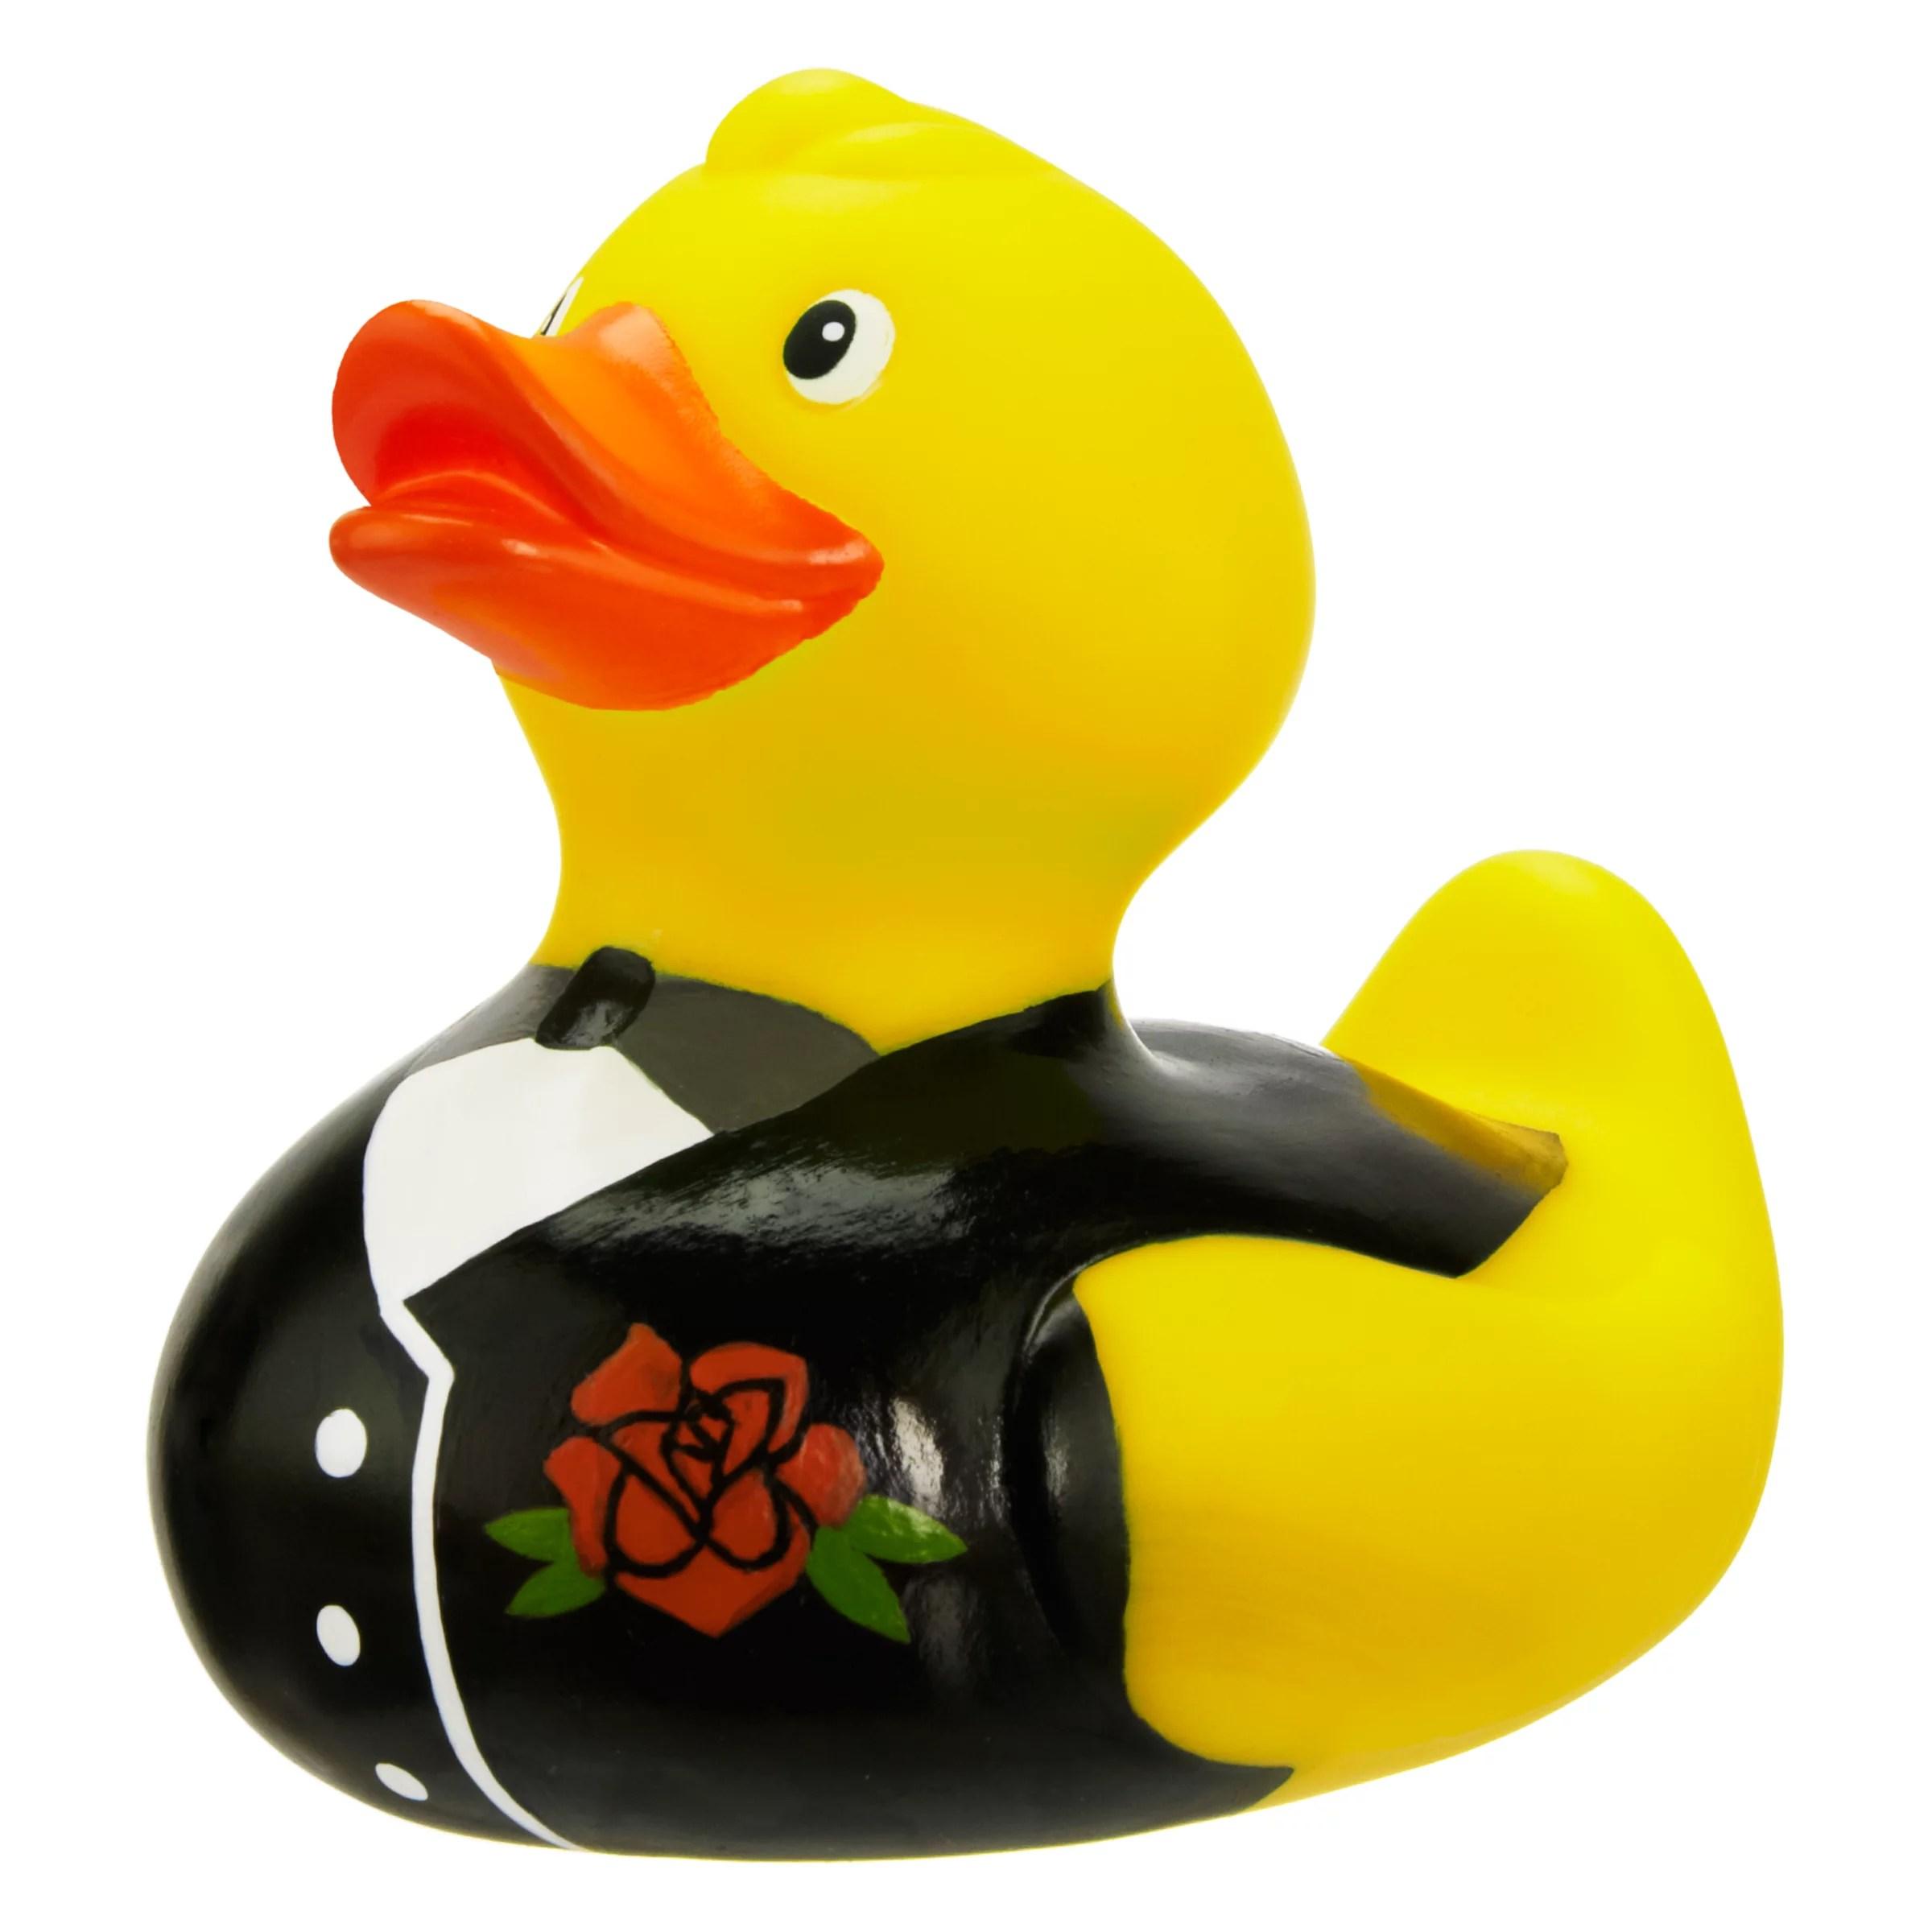 Rubber Duck Smart